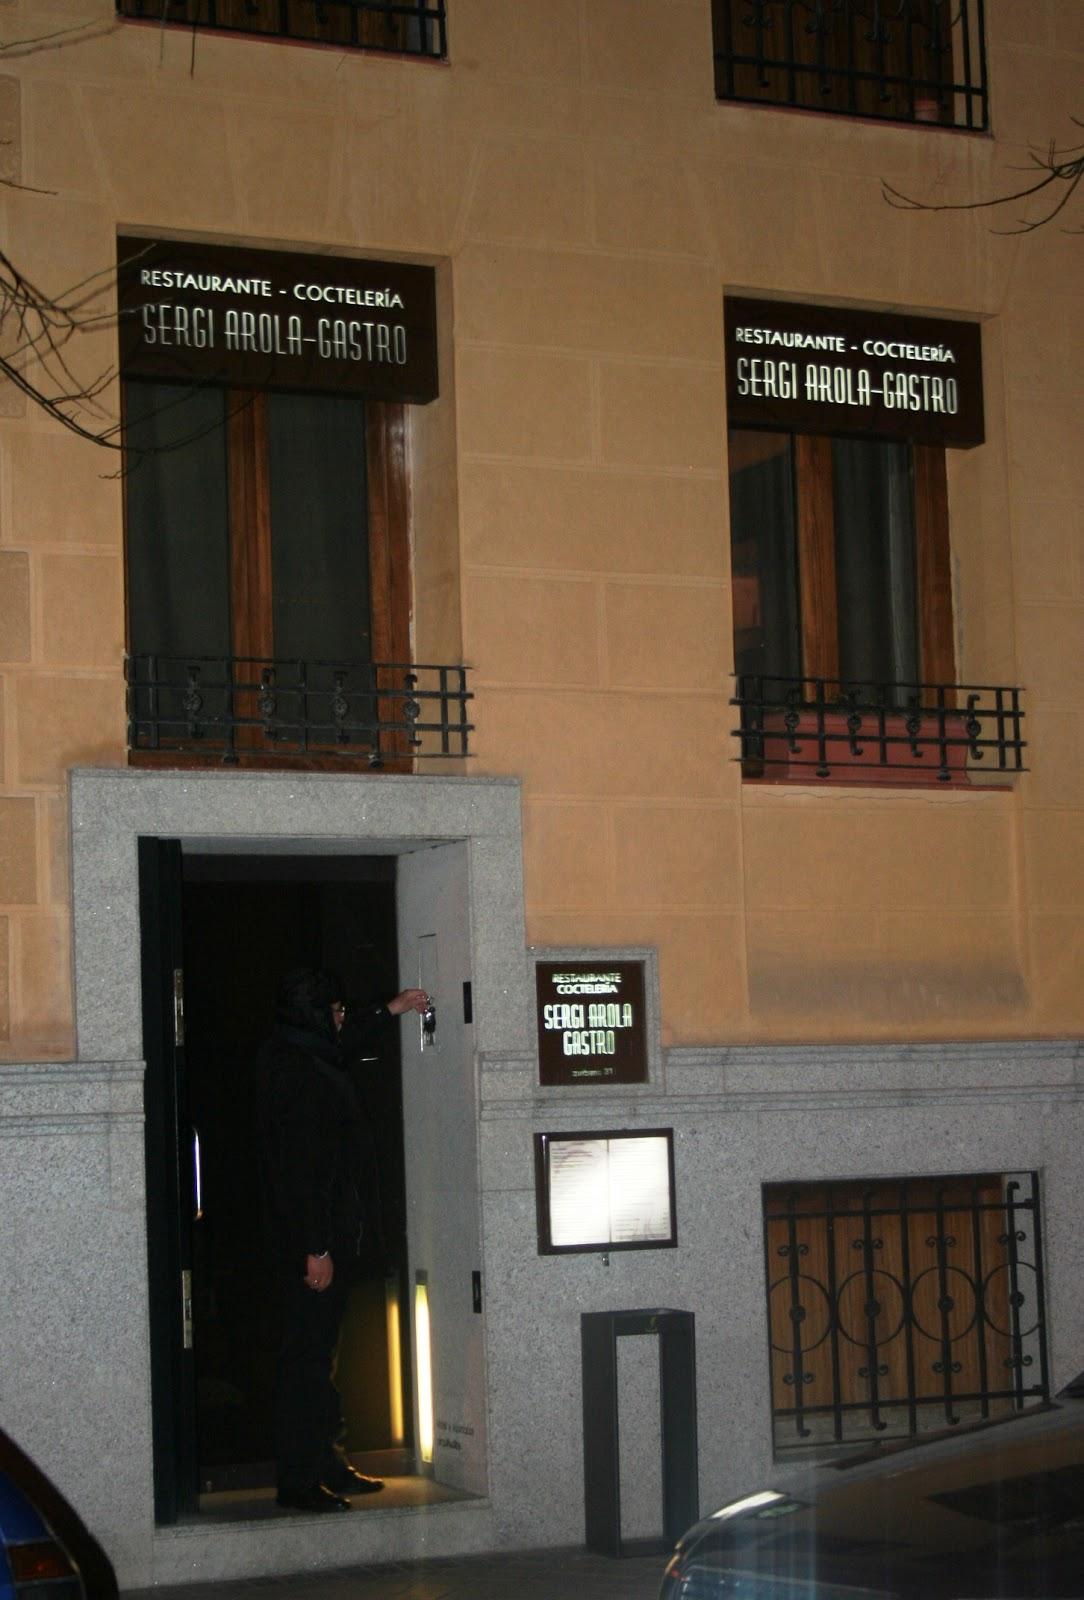 Sergi arola gastro paperblog - Restaurante sergi arola en madrid ...